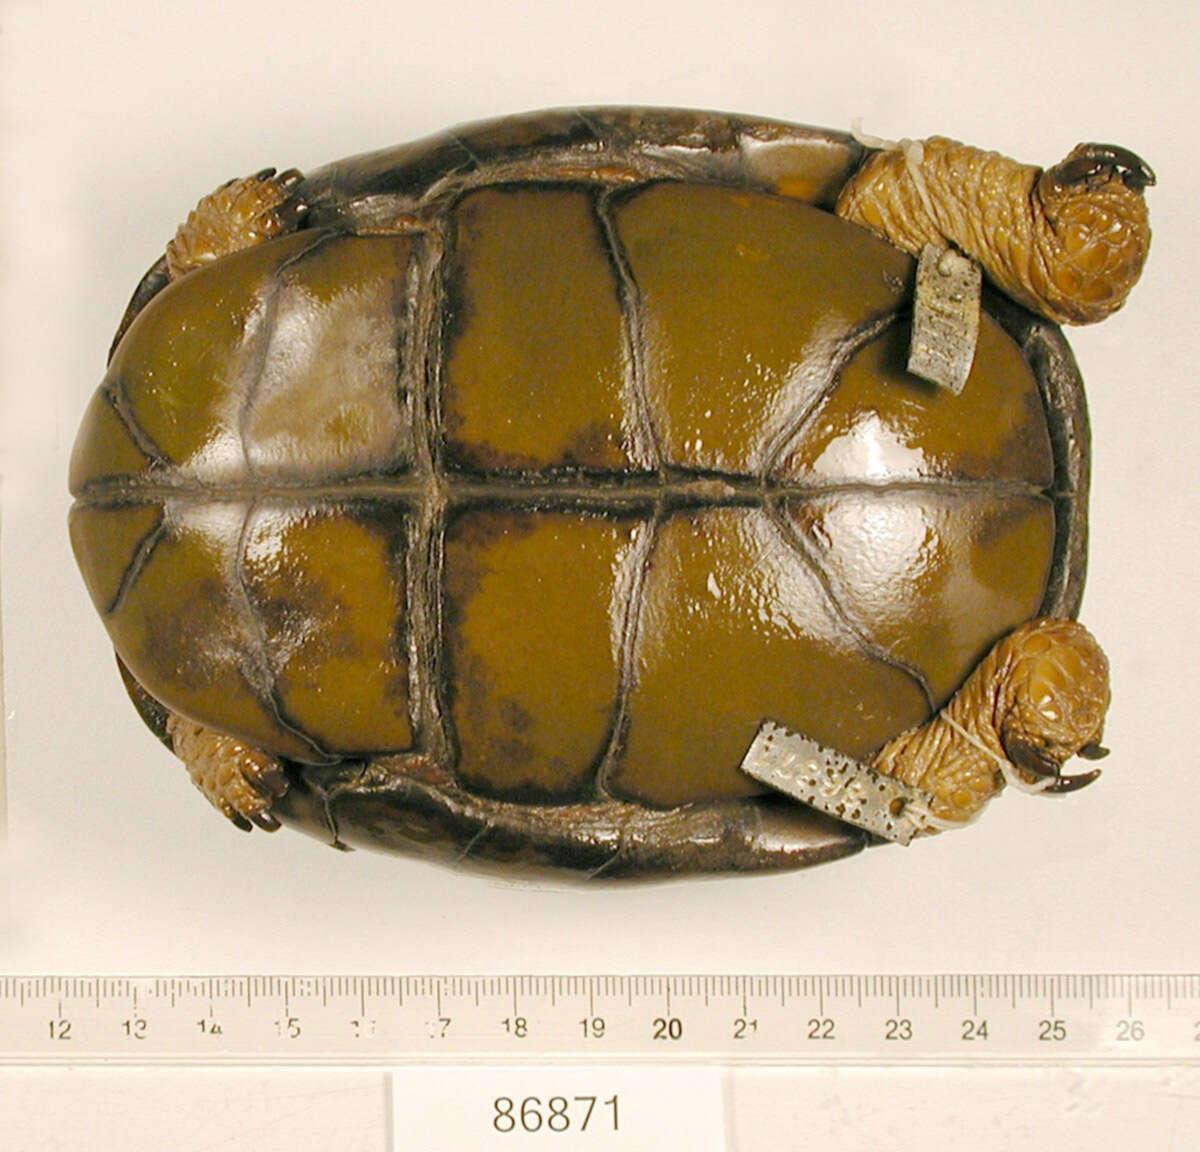 Image of turtles